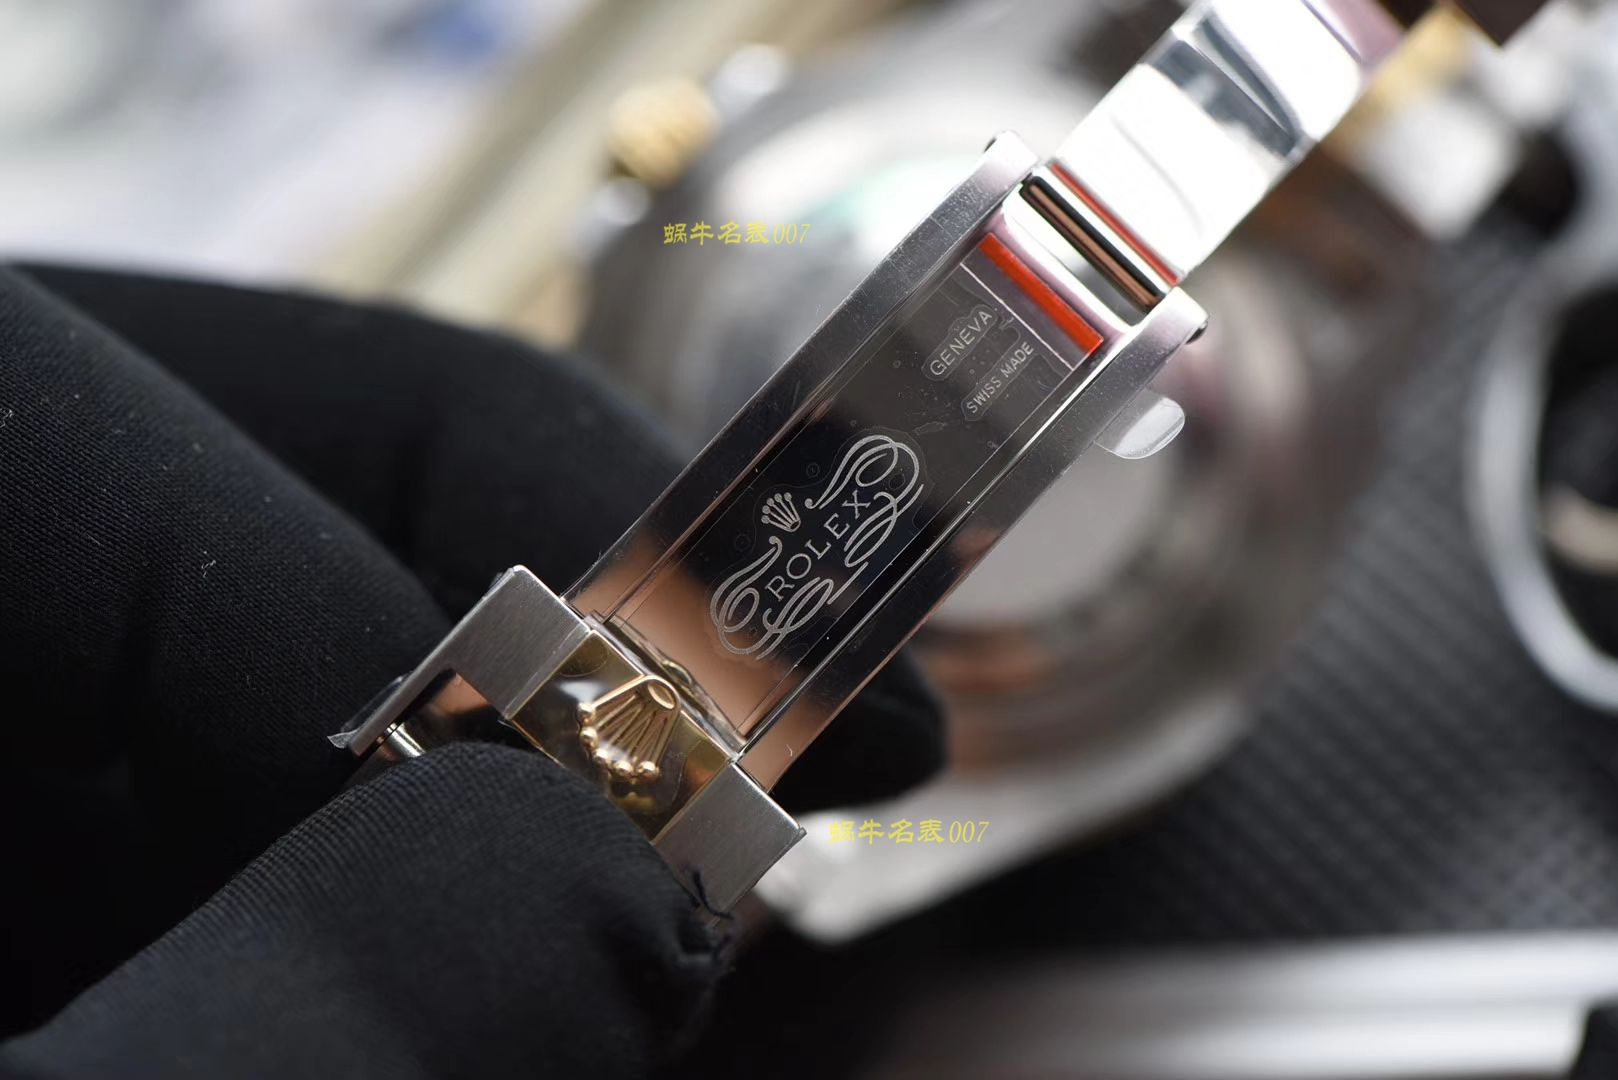 【AR厂一比一超A复刻劳力士单黄间金鬼王最强副本】劳力士SEA-DEWLLER 126603海使型系列m126603-0001腕表